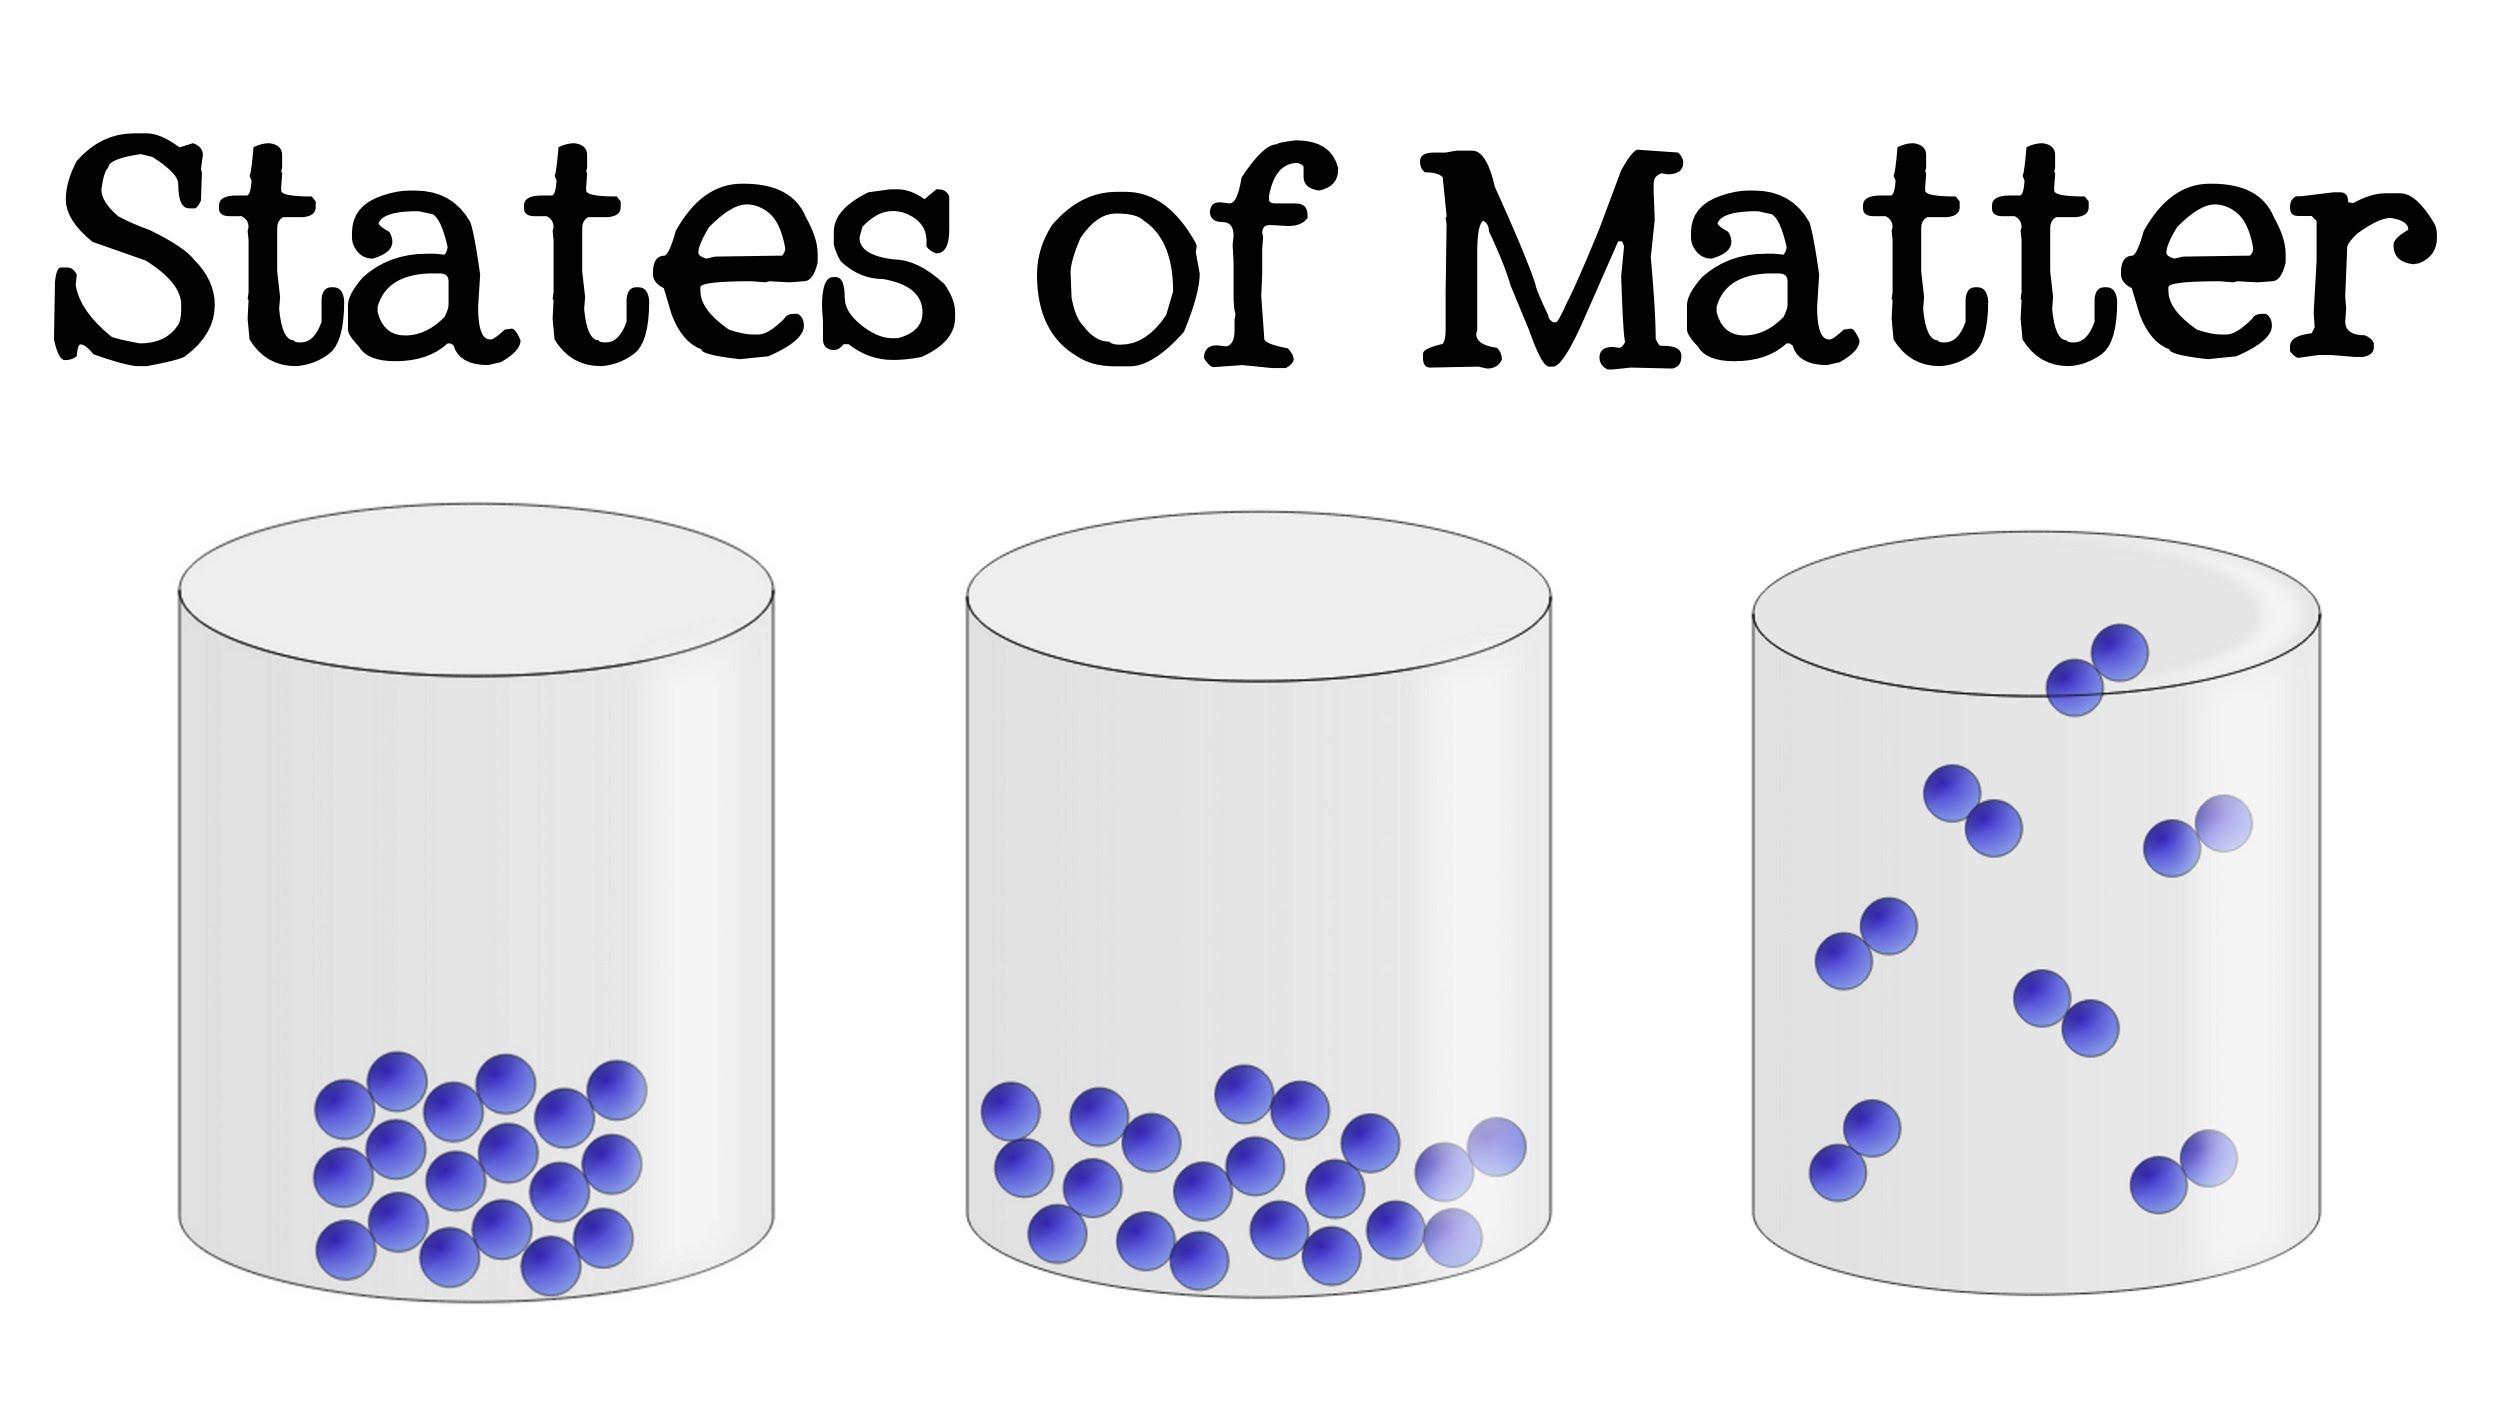 States of matter clipart blogsbeta 2